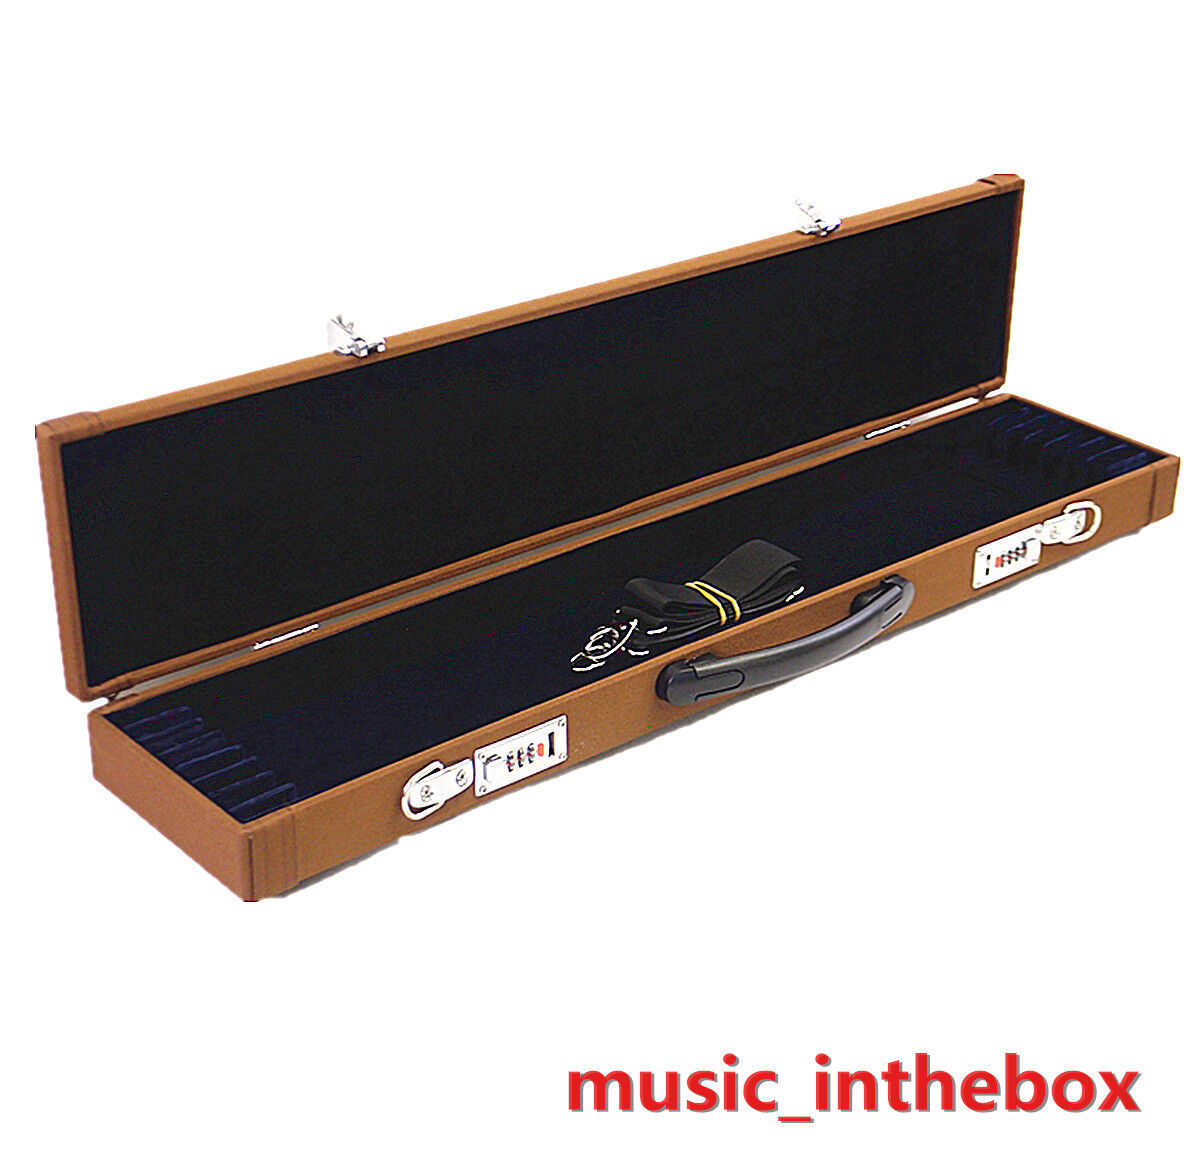 New Enhanced braun Wooden 8-Bow Case - Fit 4 4 violin lila cello bows